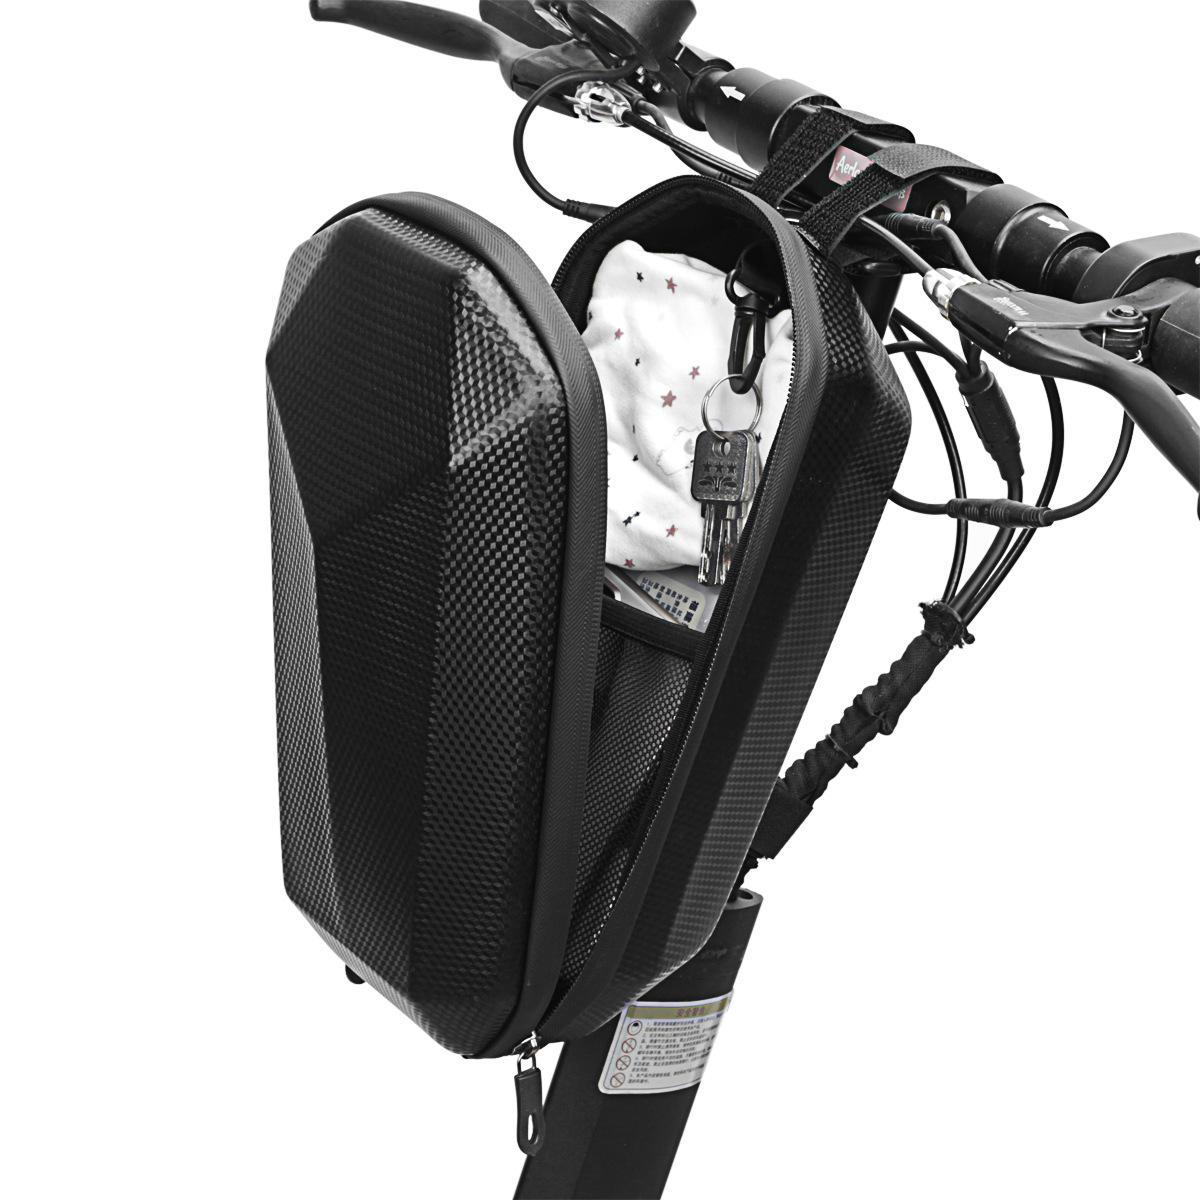 B-SOUL 4L Impermeable EVA Scooters eléctricos resistentes al desgaste Marco delantero de la bicicleta Bolsa Bicicleta MT